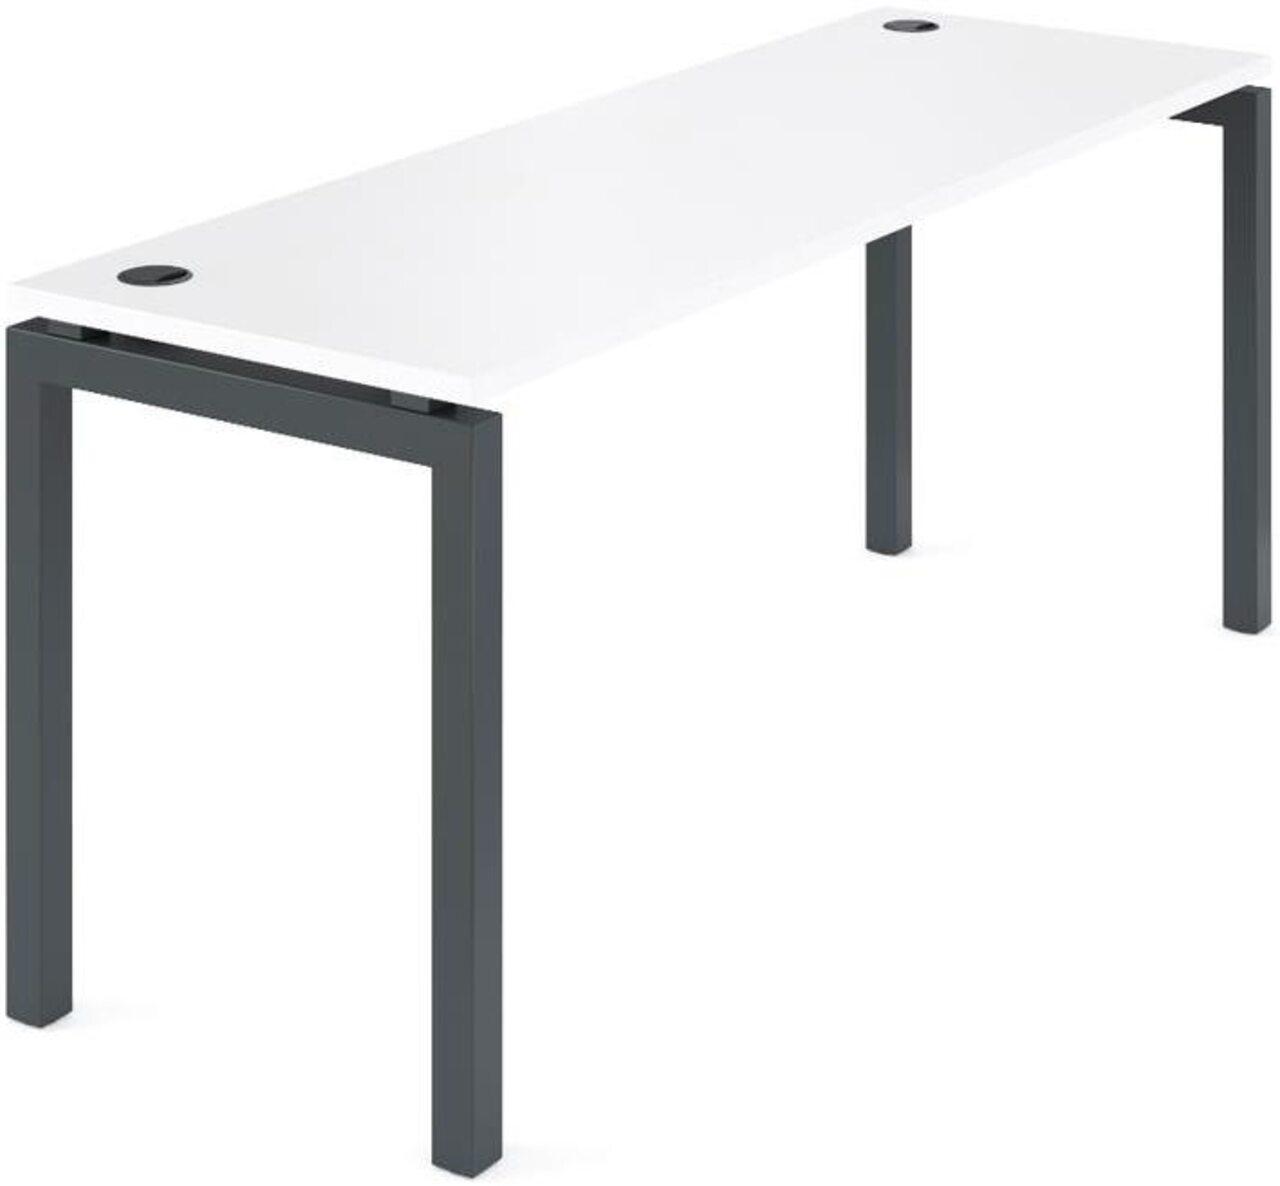 Стол на металлокаркасе  Арго 180x60x76 - фото 1